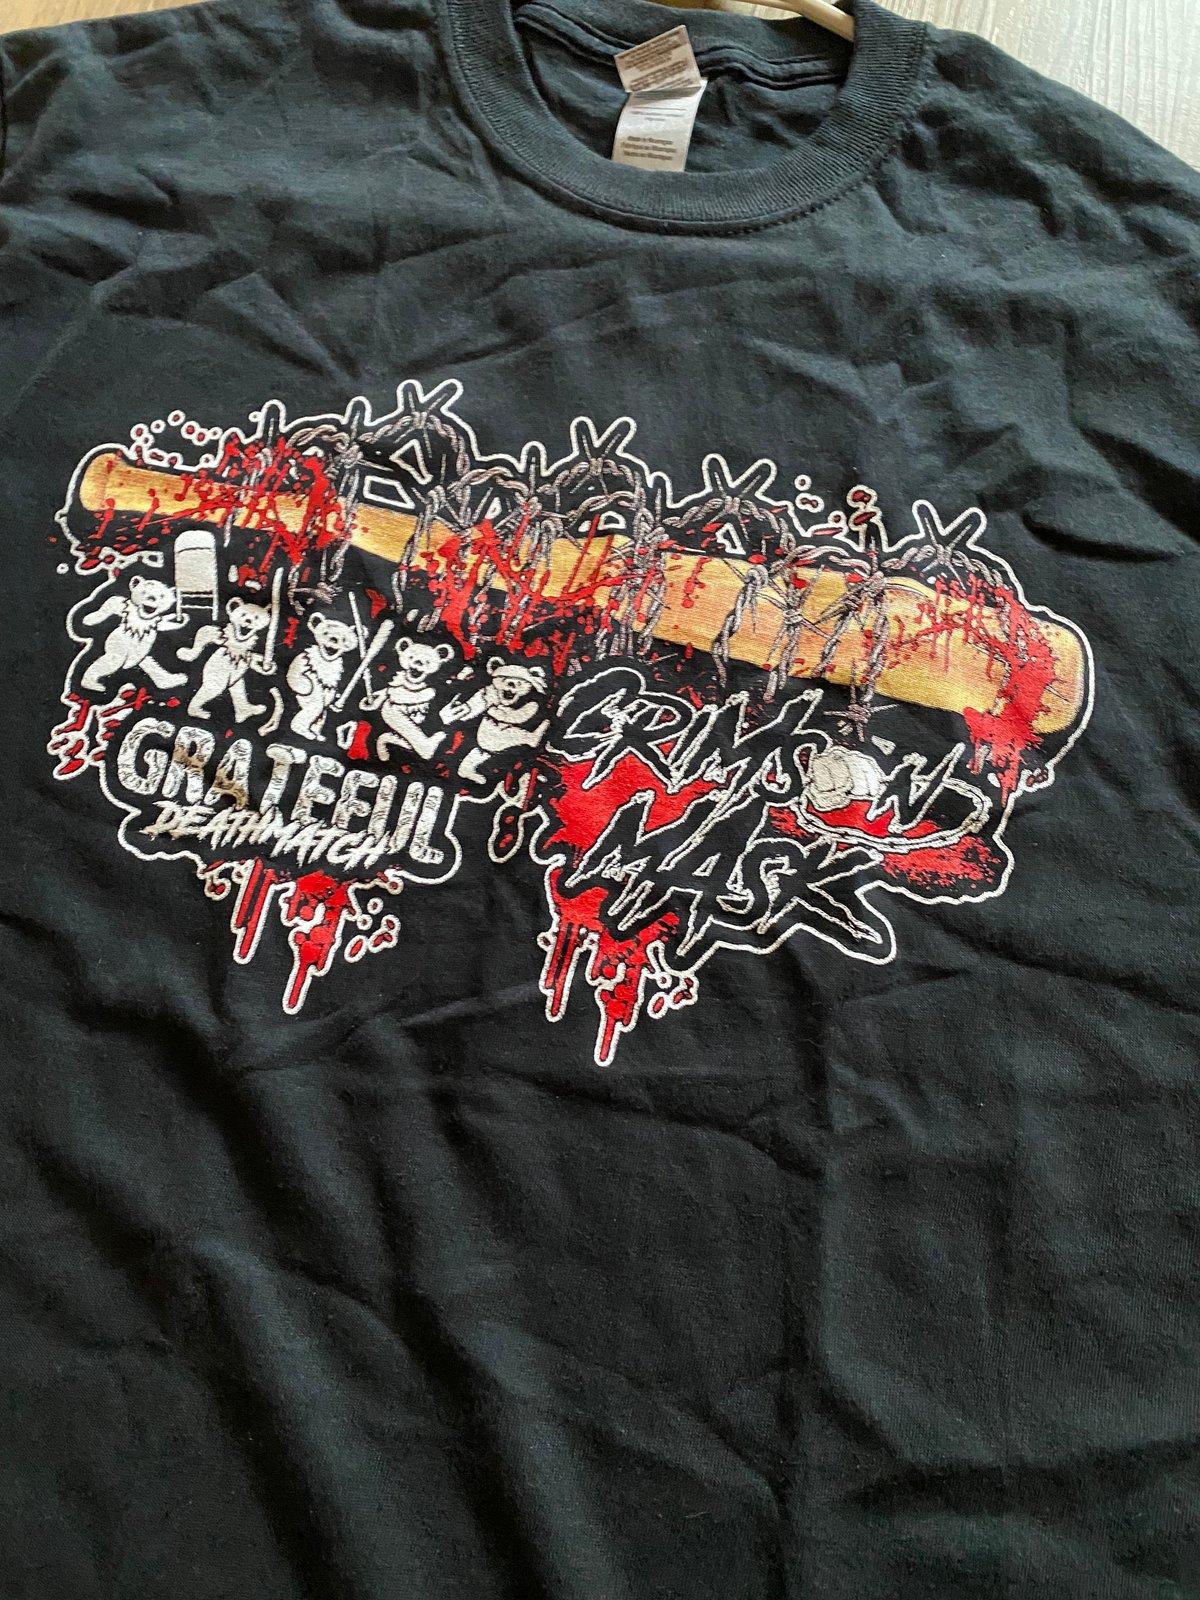 Crimson Mask x Grateful Deathmatch Collab Shirt